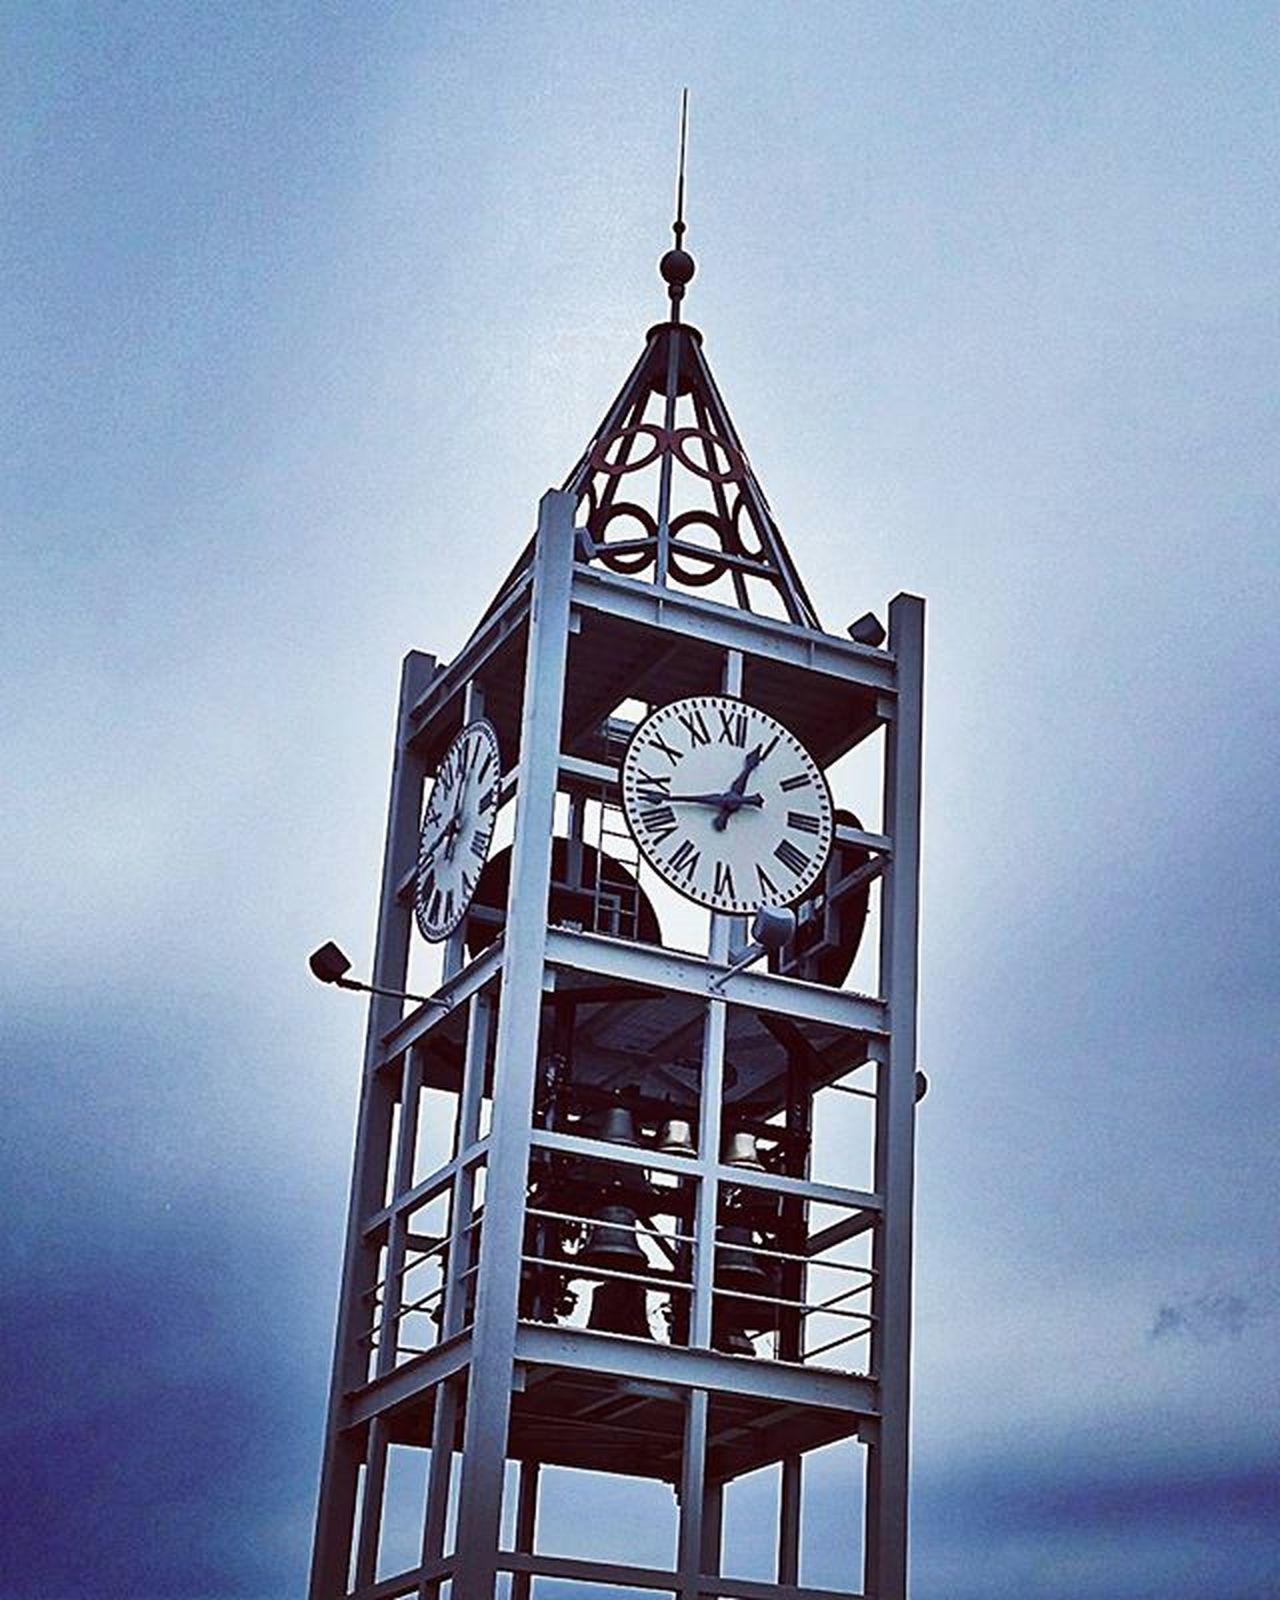 Photographyislifee Picoftheday Photography Abstractphotography Artiseverywhere Photooftheday FALLRIVER Massachusetts Durfee Clock Clocktower Bells